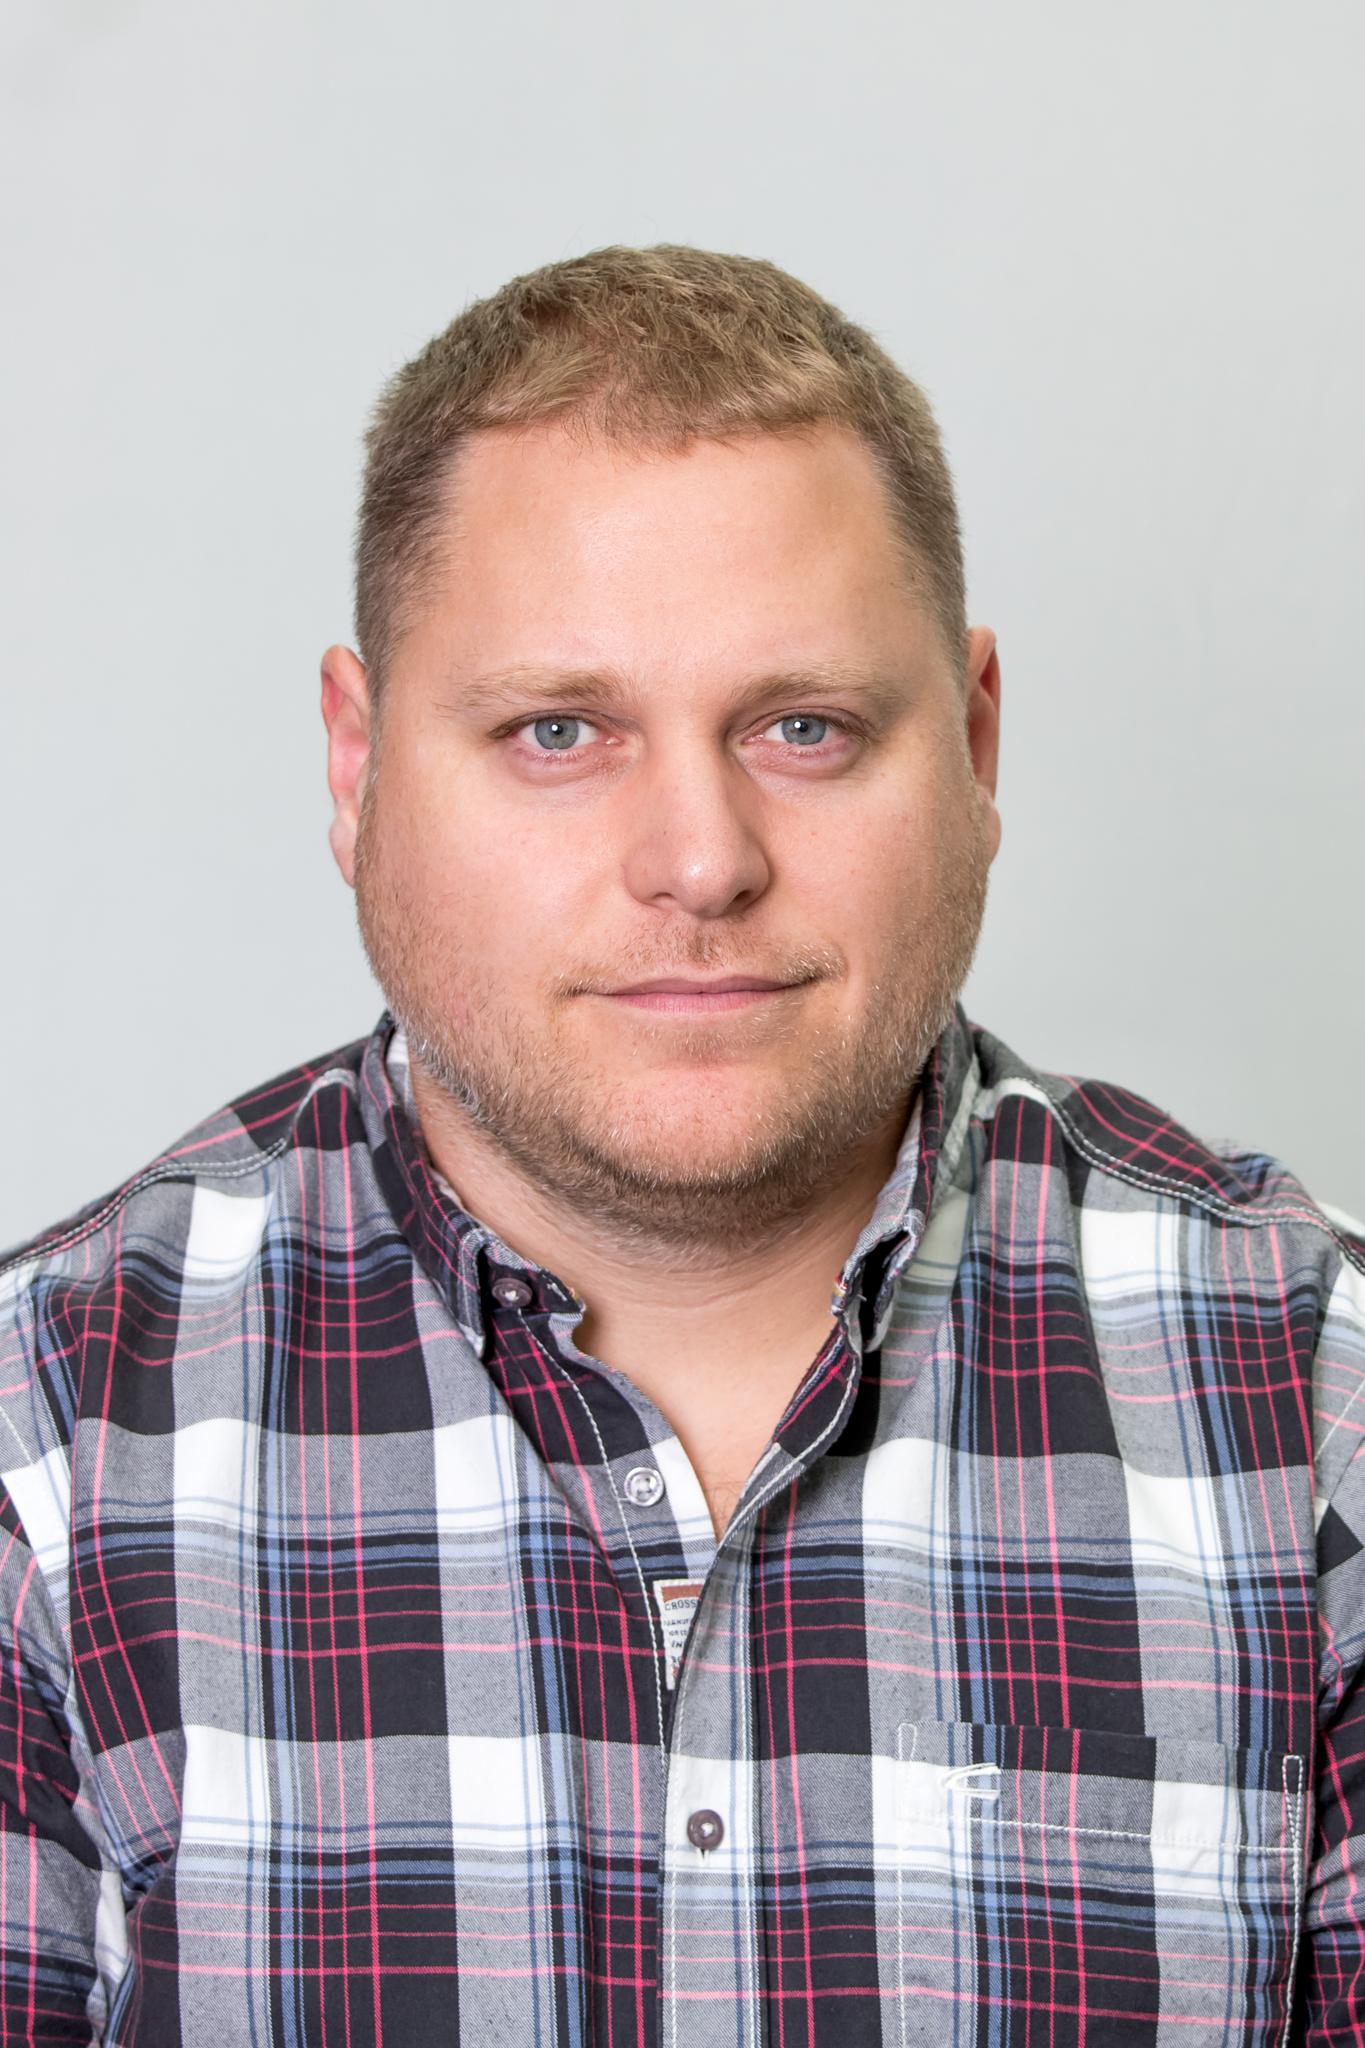 Jan-Tore Pedersen, MVP